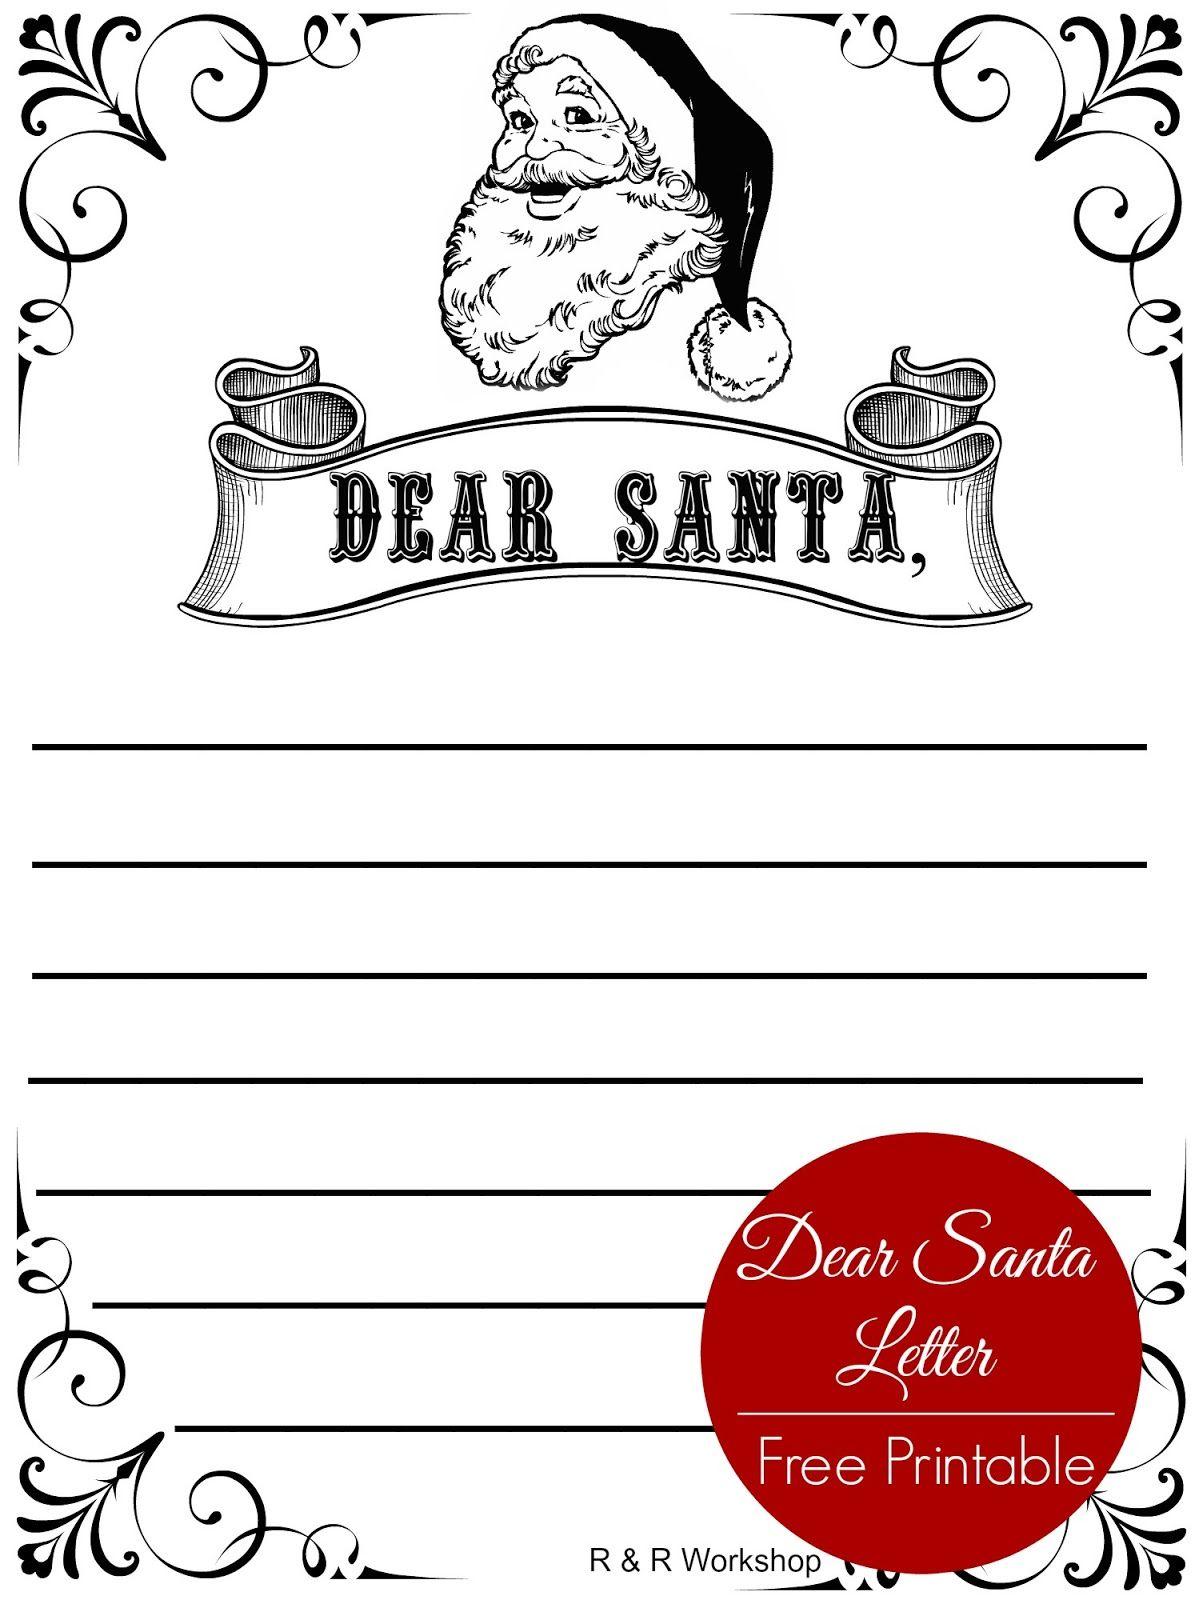 Workshop Free Printable Christmas Music Song Sheets Dear Santa Letter